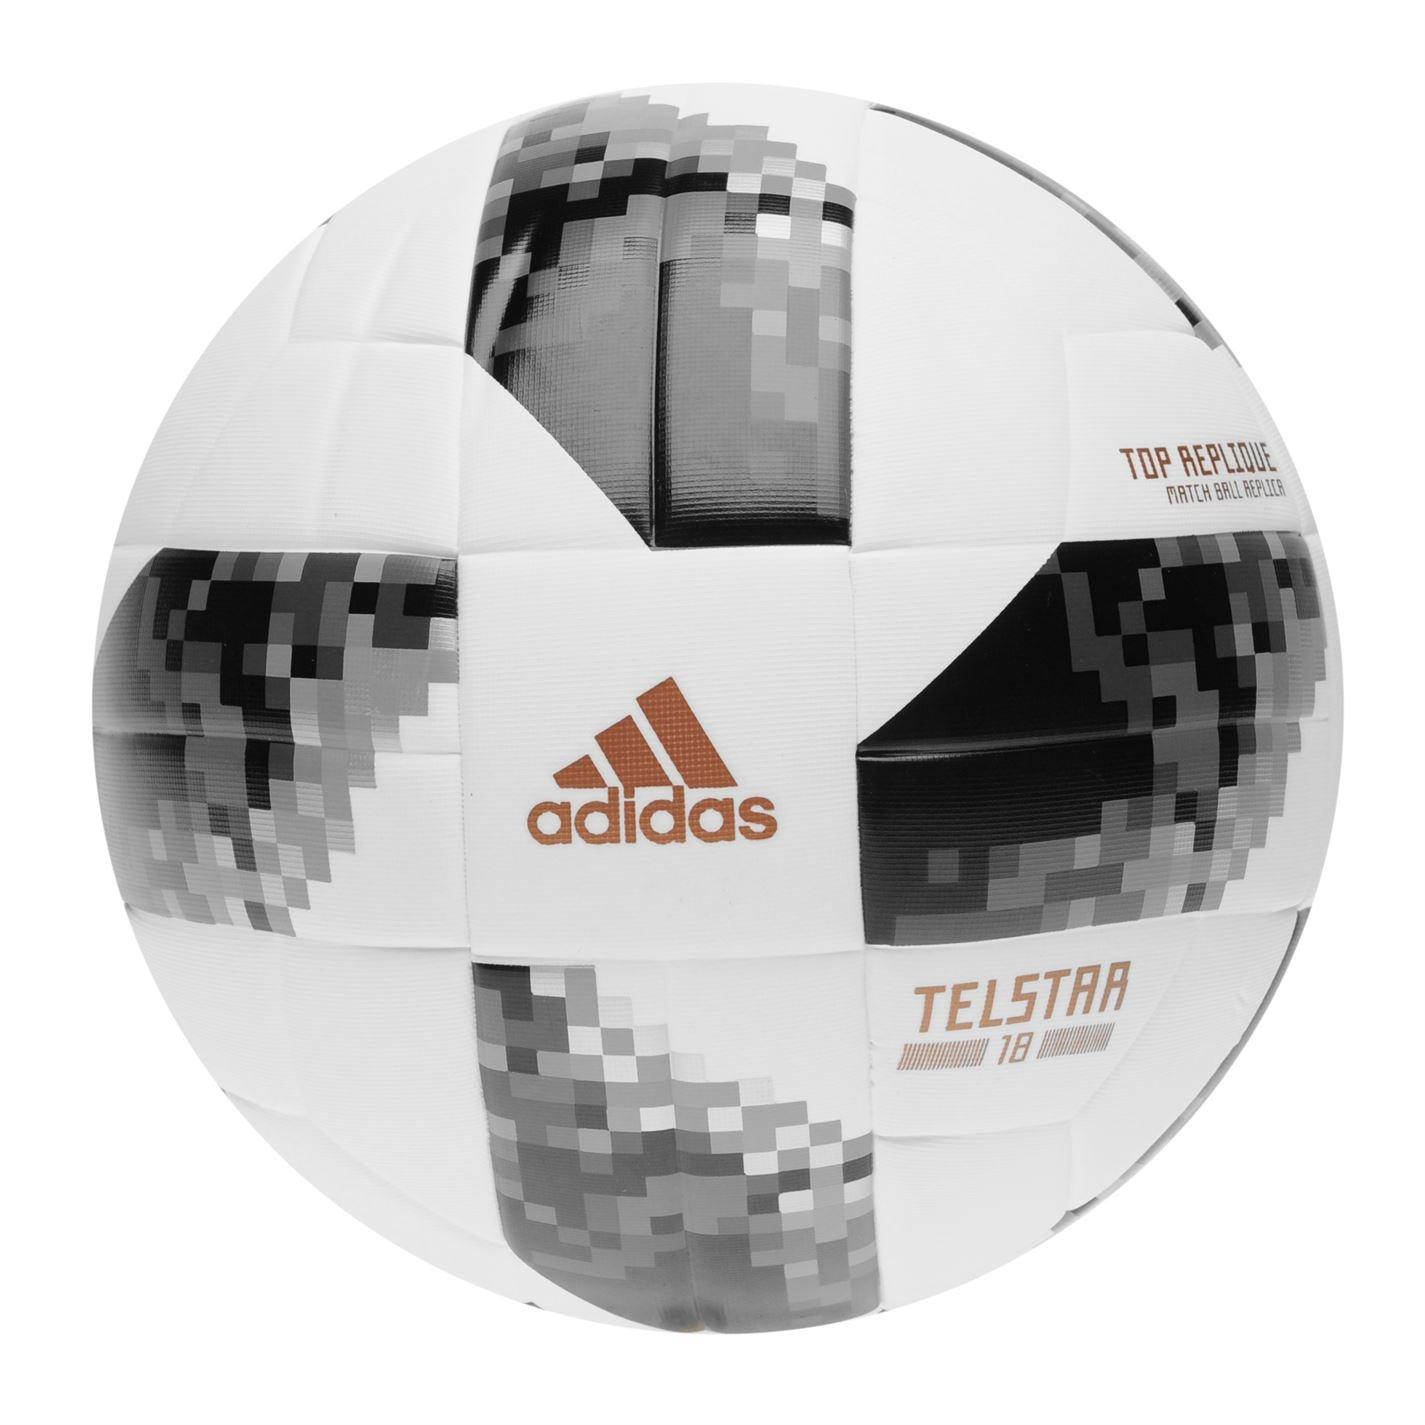 BALL FIFA WORLD CUP TOP REPLIQUE White/Black/Silver Metallic 2018 Adidas 5 ADIL0|#adidas CE8091